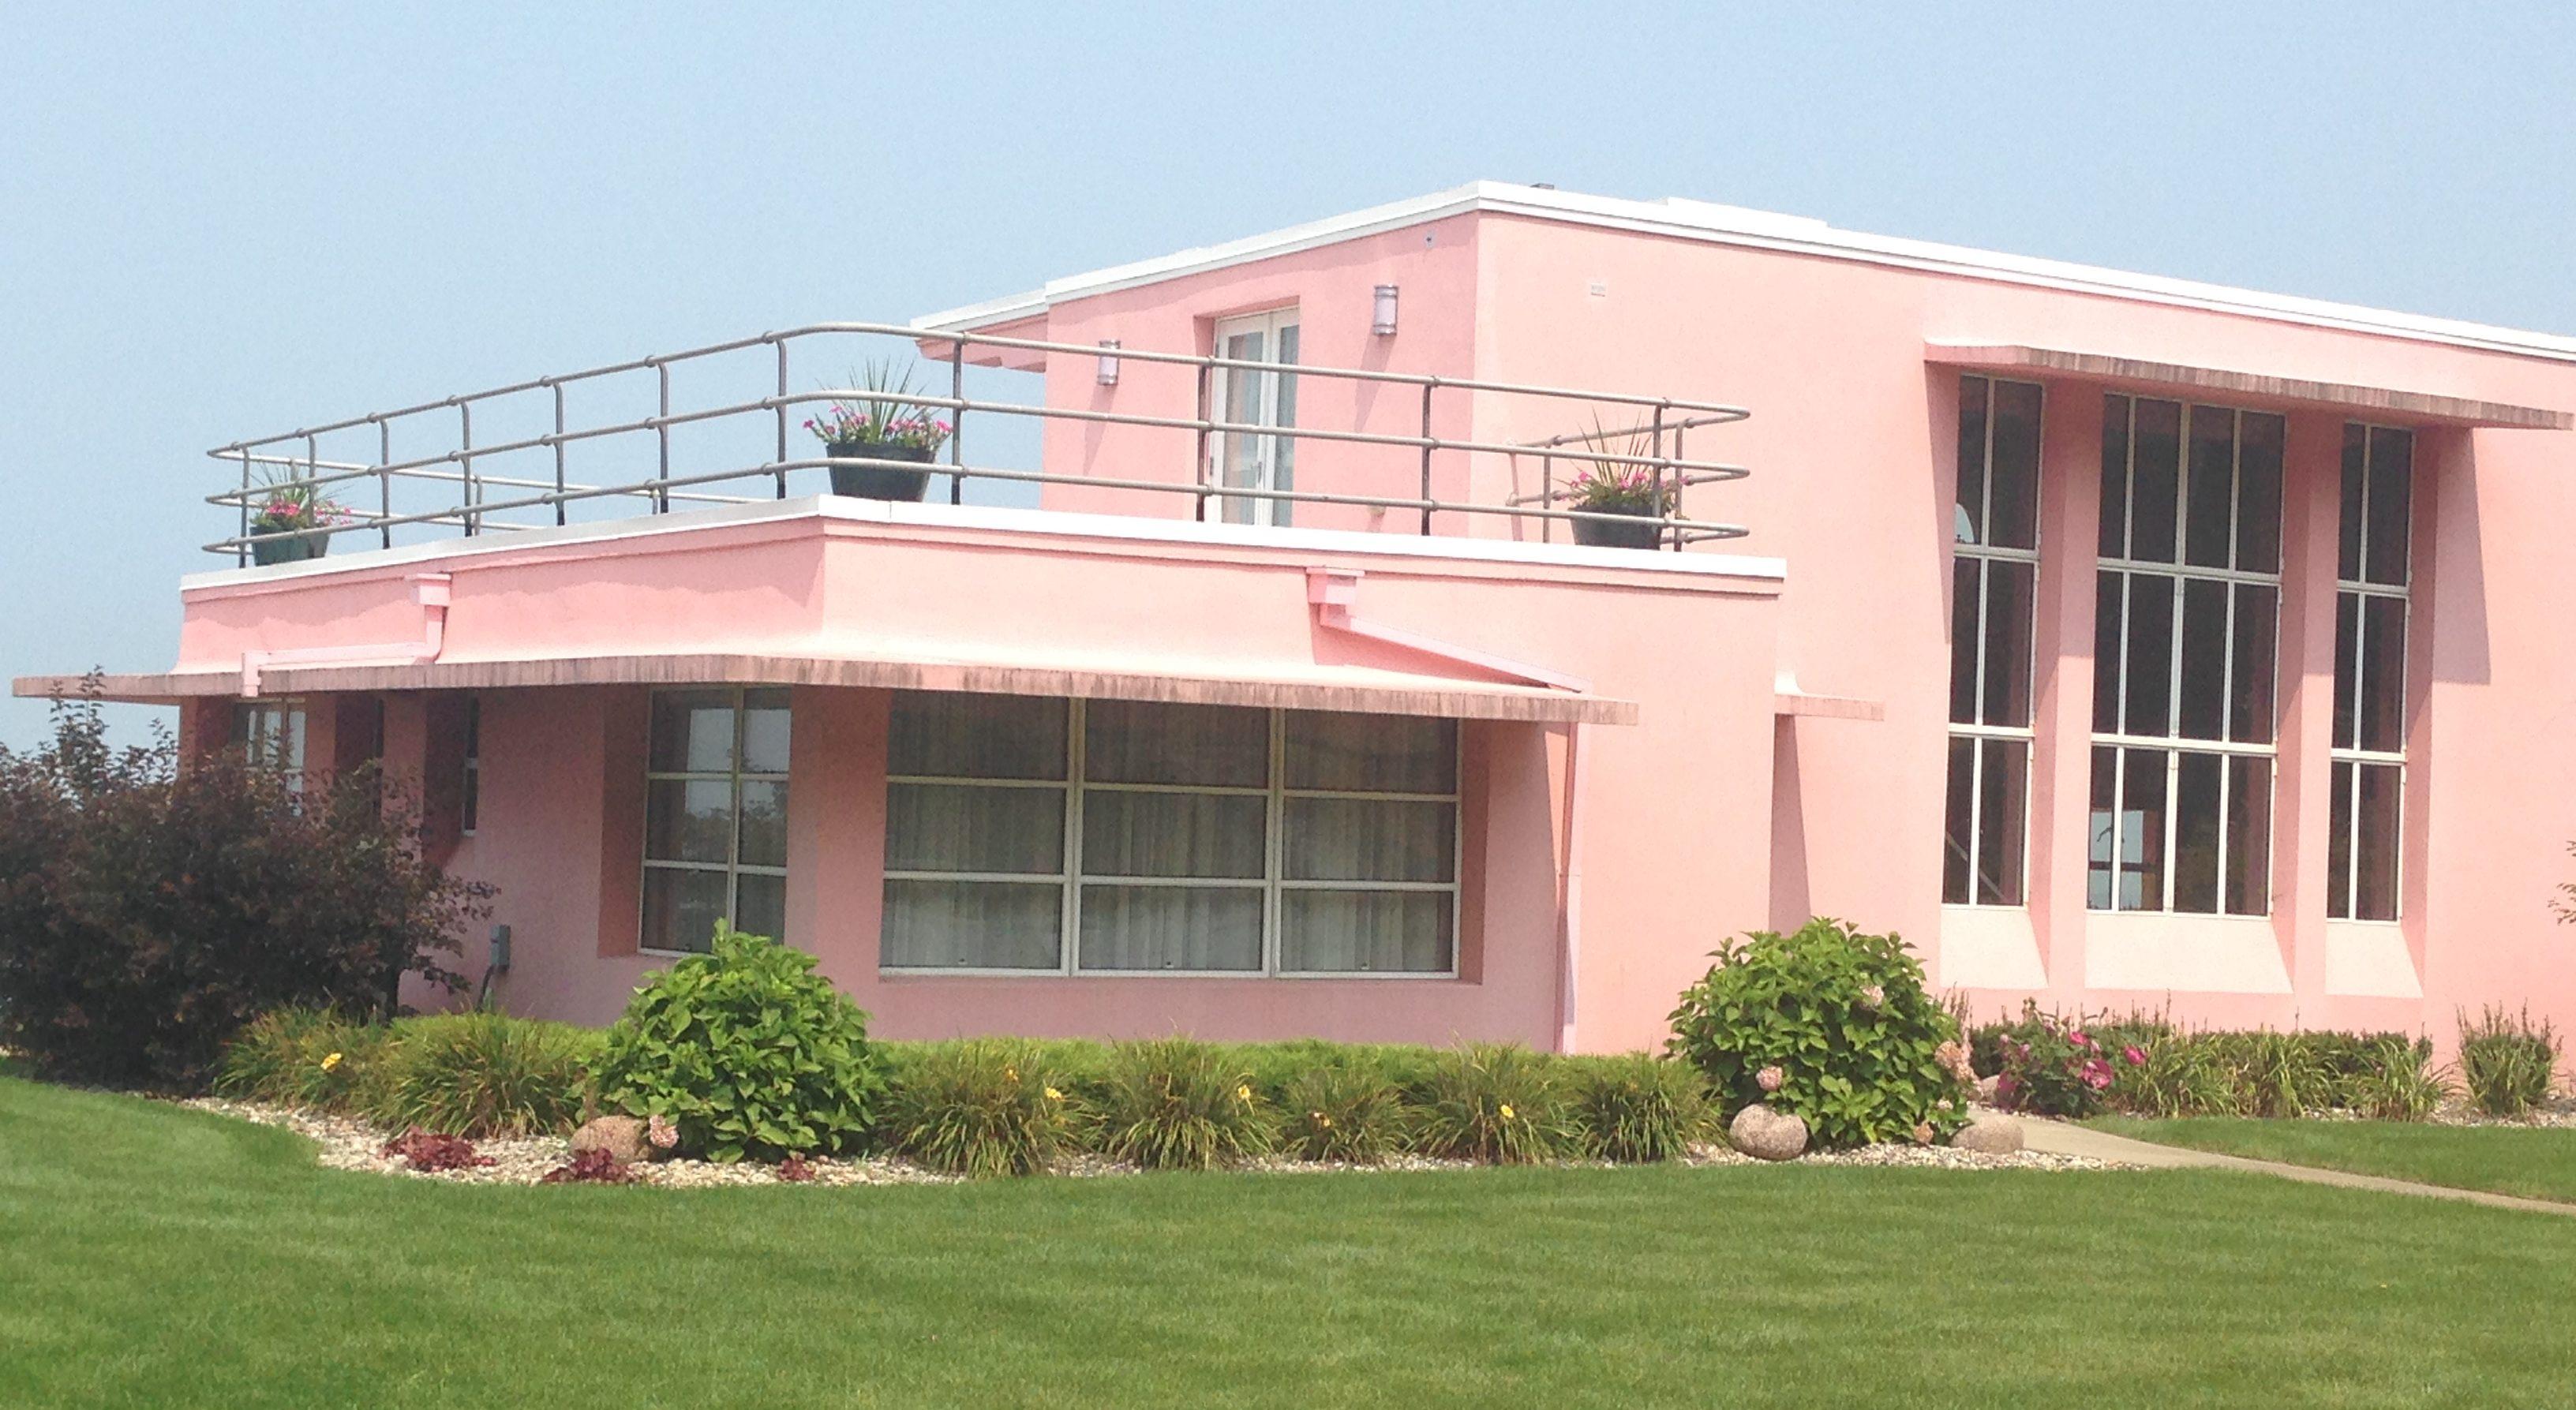 Indiana Dunes century of profess florida home e1581358673432